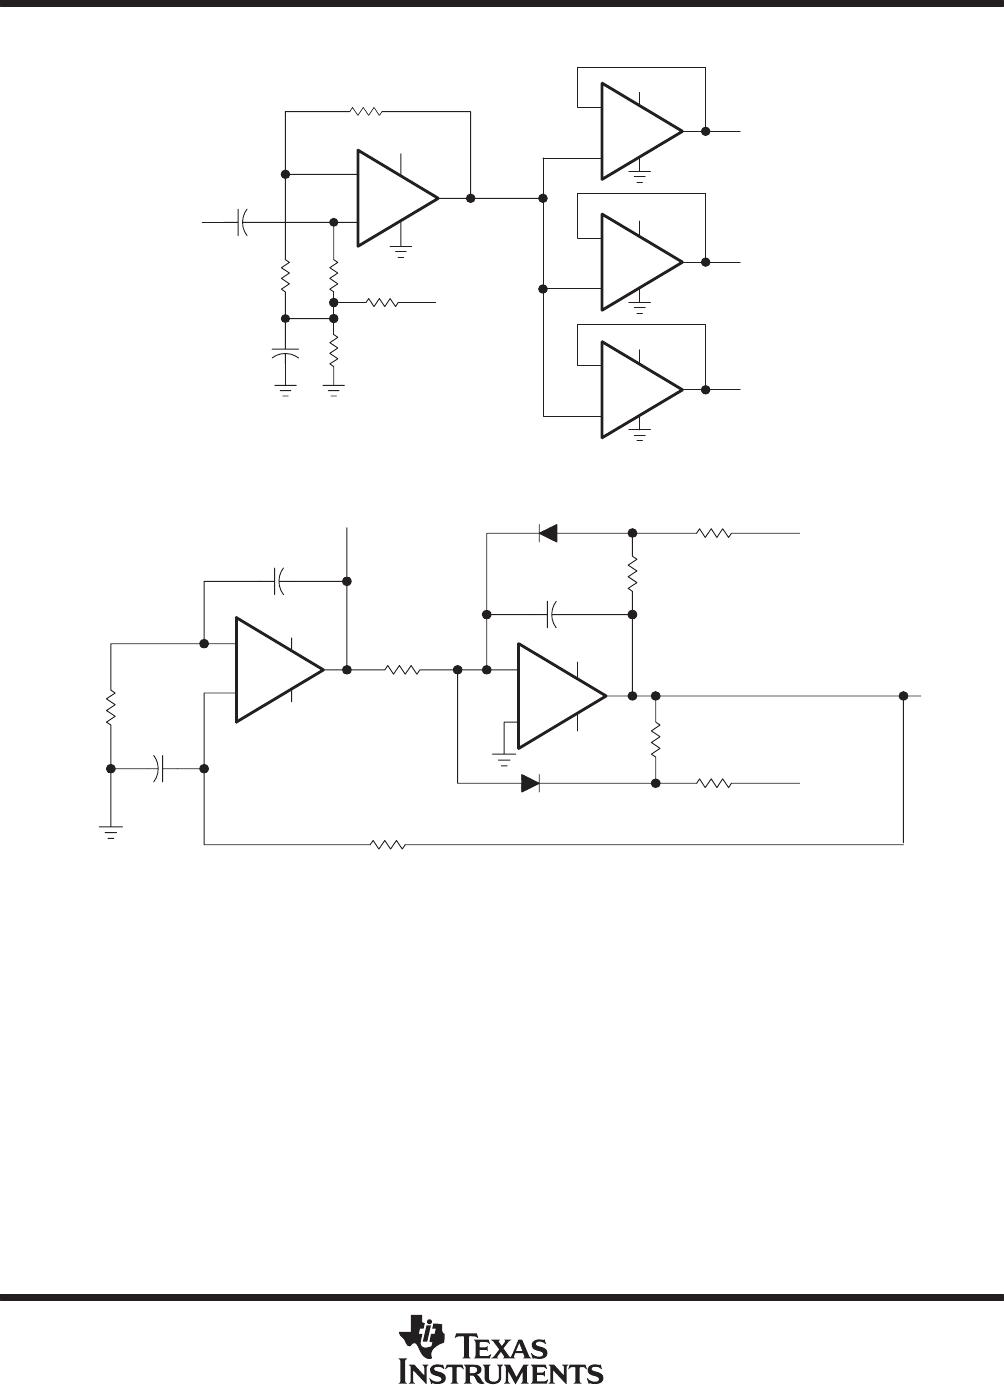 tl084mjb pdf下载及第15页内容在线浏览